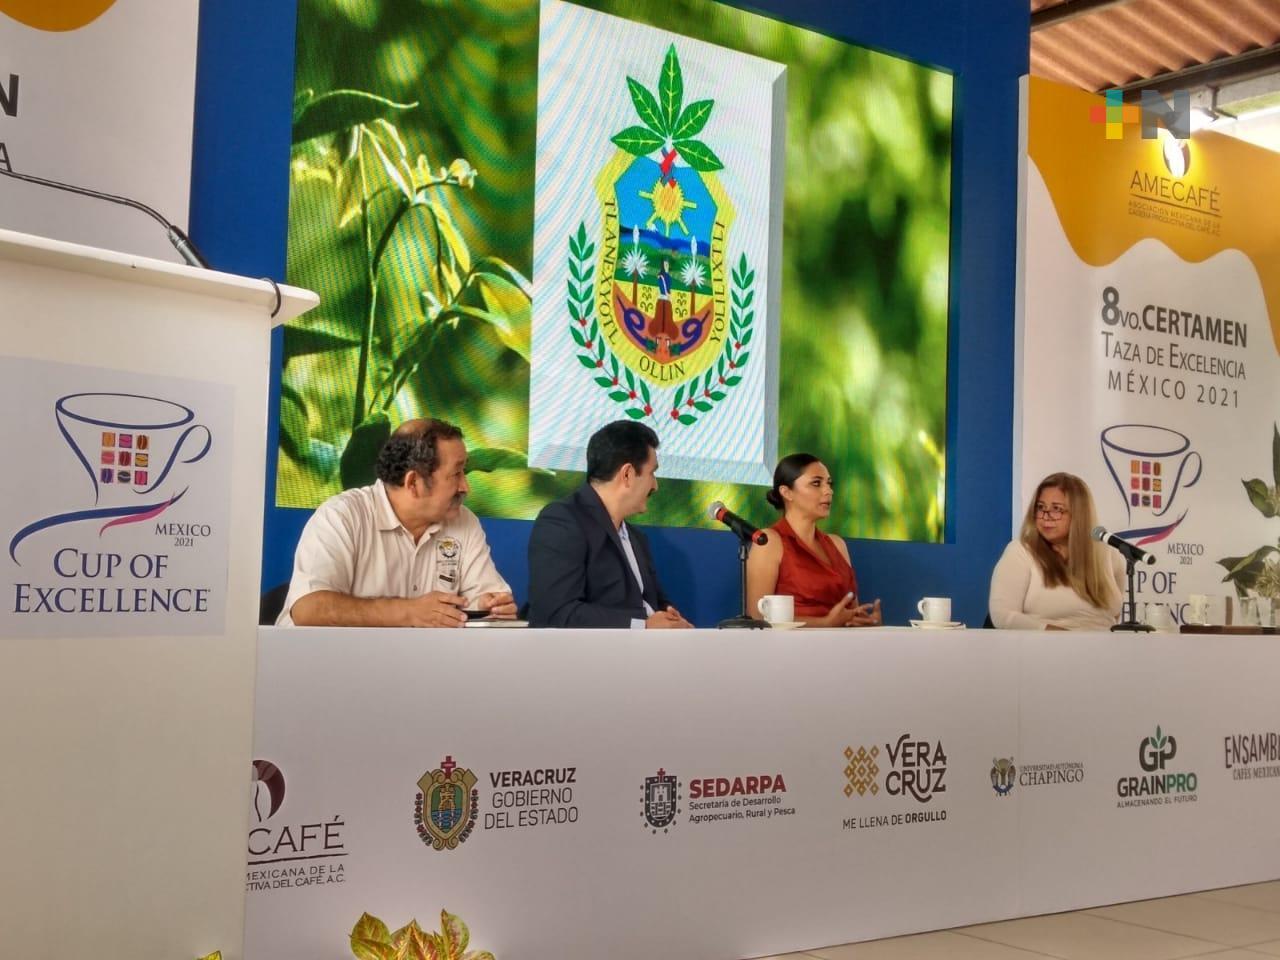 Certamen Taza de Excelencia México se realizó Ixhuatlán del Café